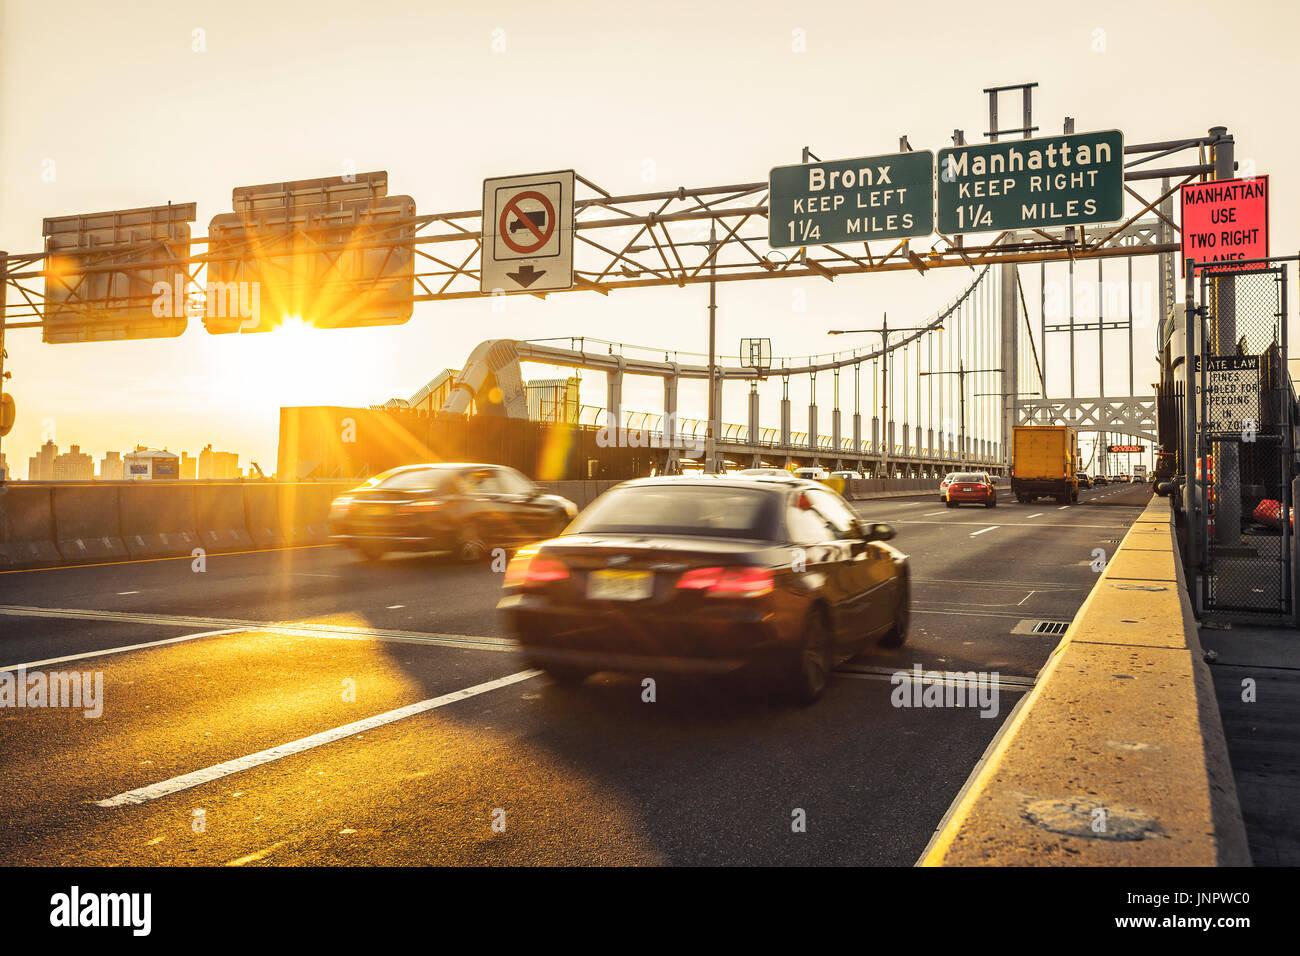 Traffic on Triborough Bridge, the Robert F. Kennedy Bridge in New York City - Stock Image